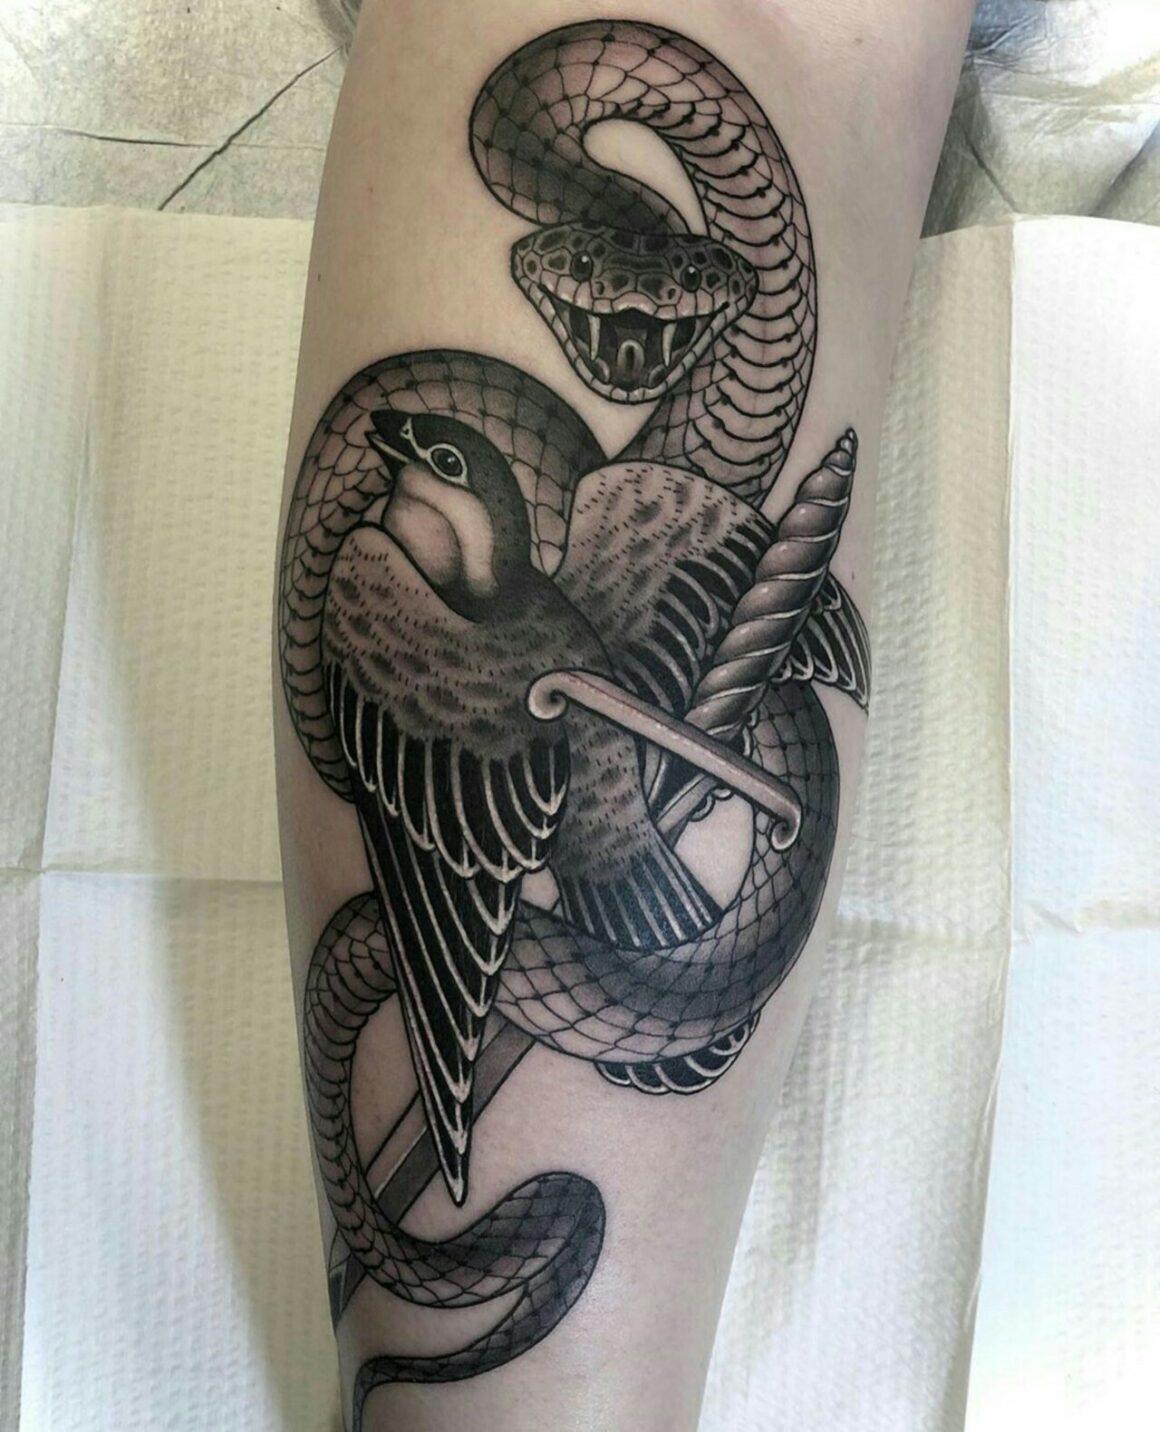 Nick Stegall, Amulet Tattoos. St. Petersburg, Russia